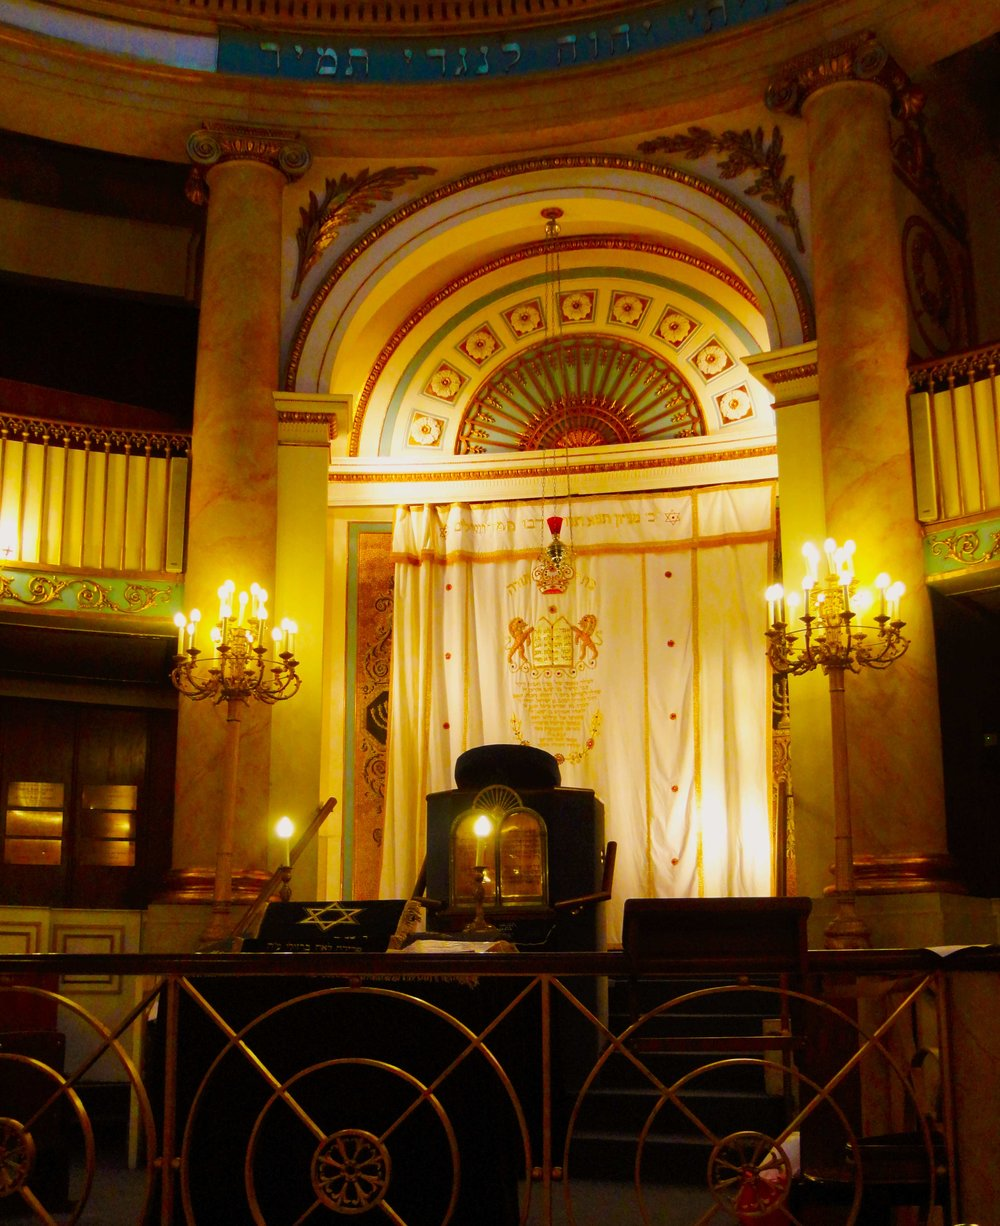 Stadttempel-synagogue